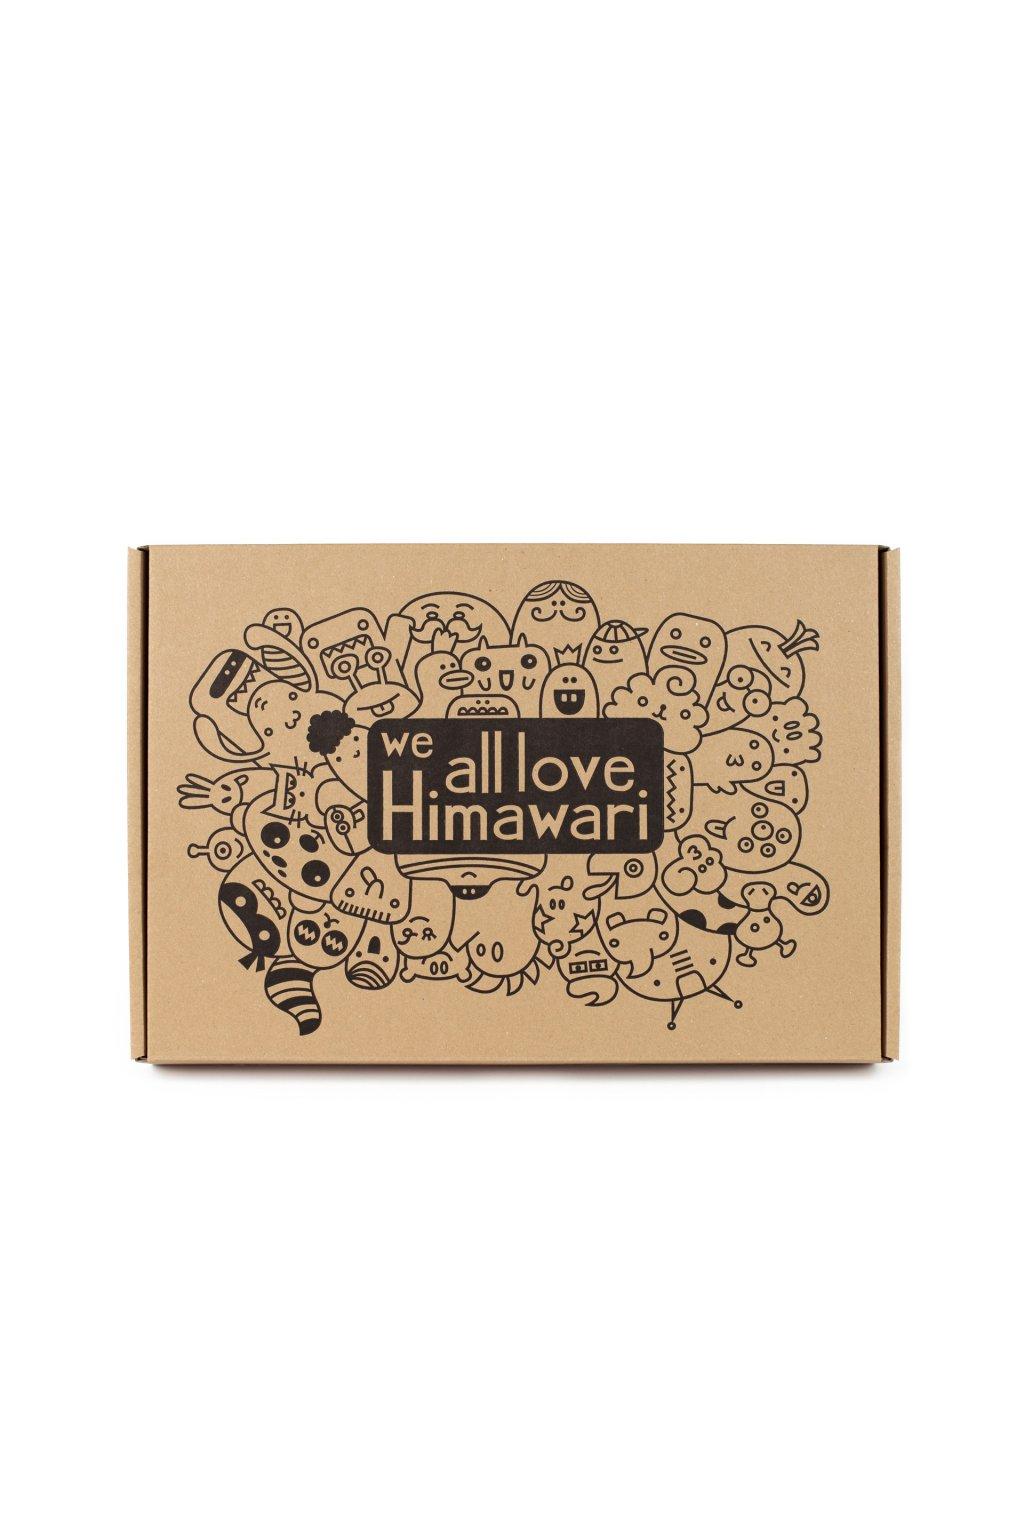 Dvoubarevný batoh Himawari nr 18 (laptop), více barev